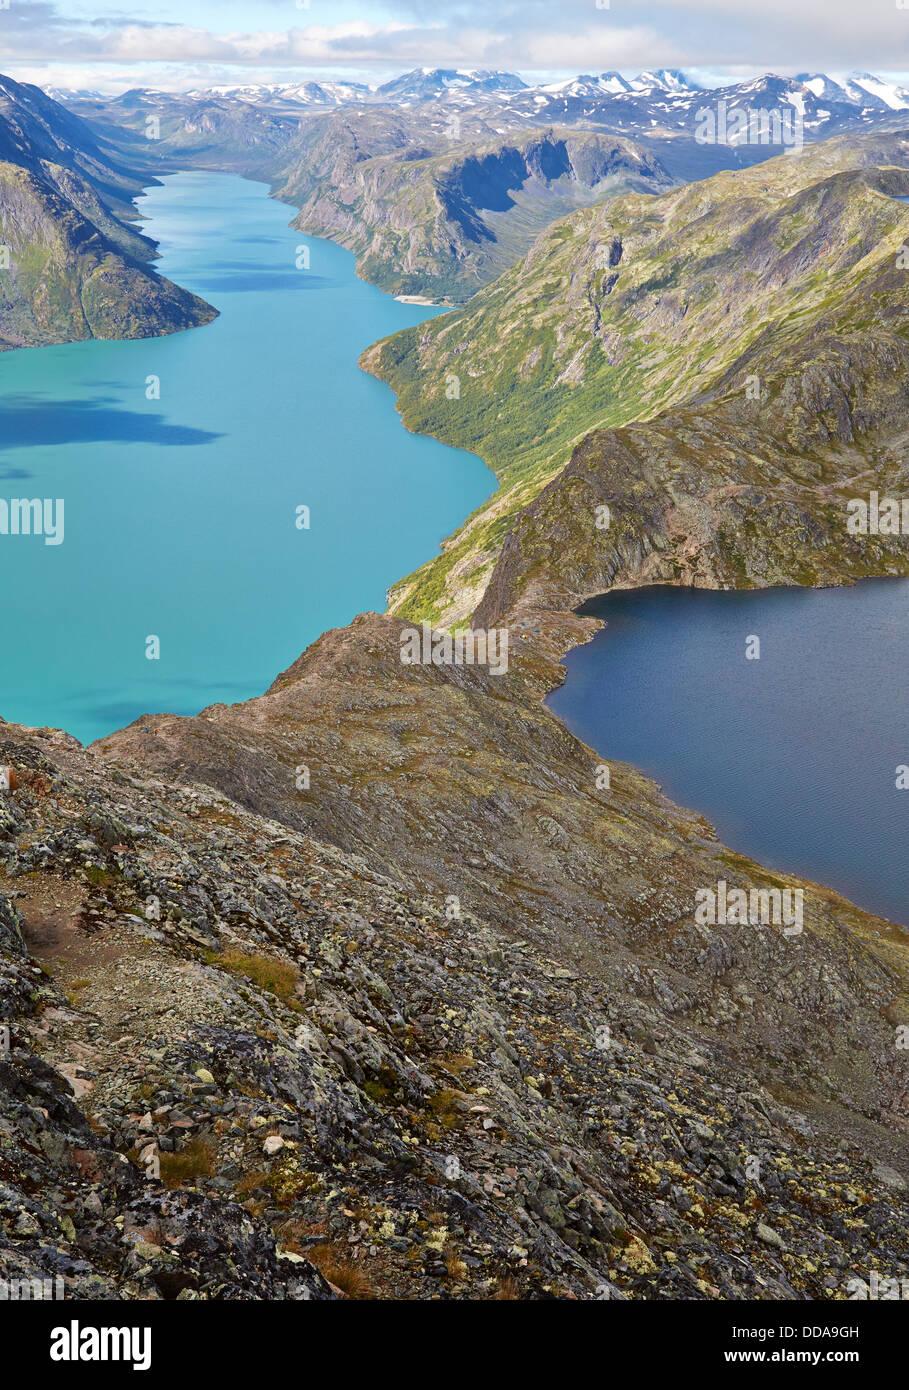 Besseggen Ridge walk in Jotunheimen National Park Norway navigates the narrow strip of rock between Lake Gjende - Stock Image